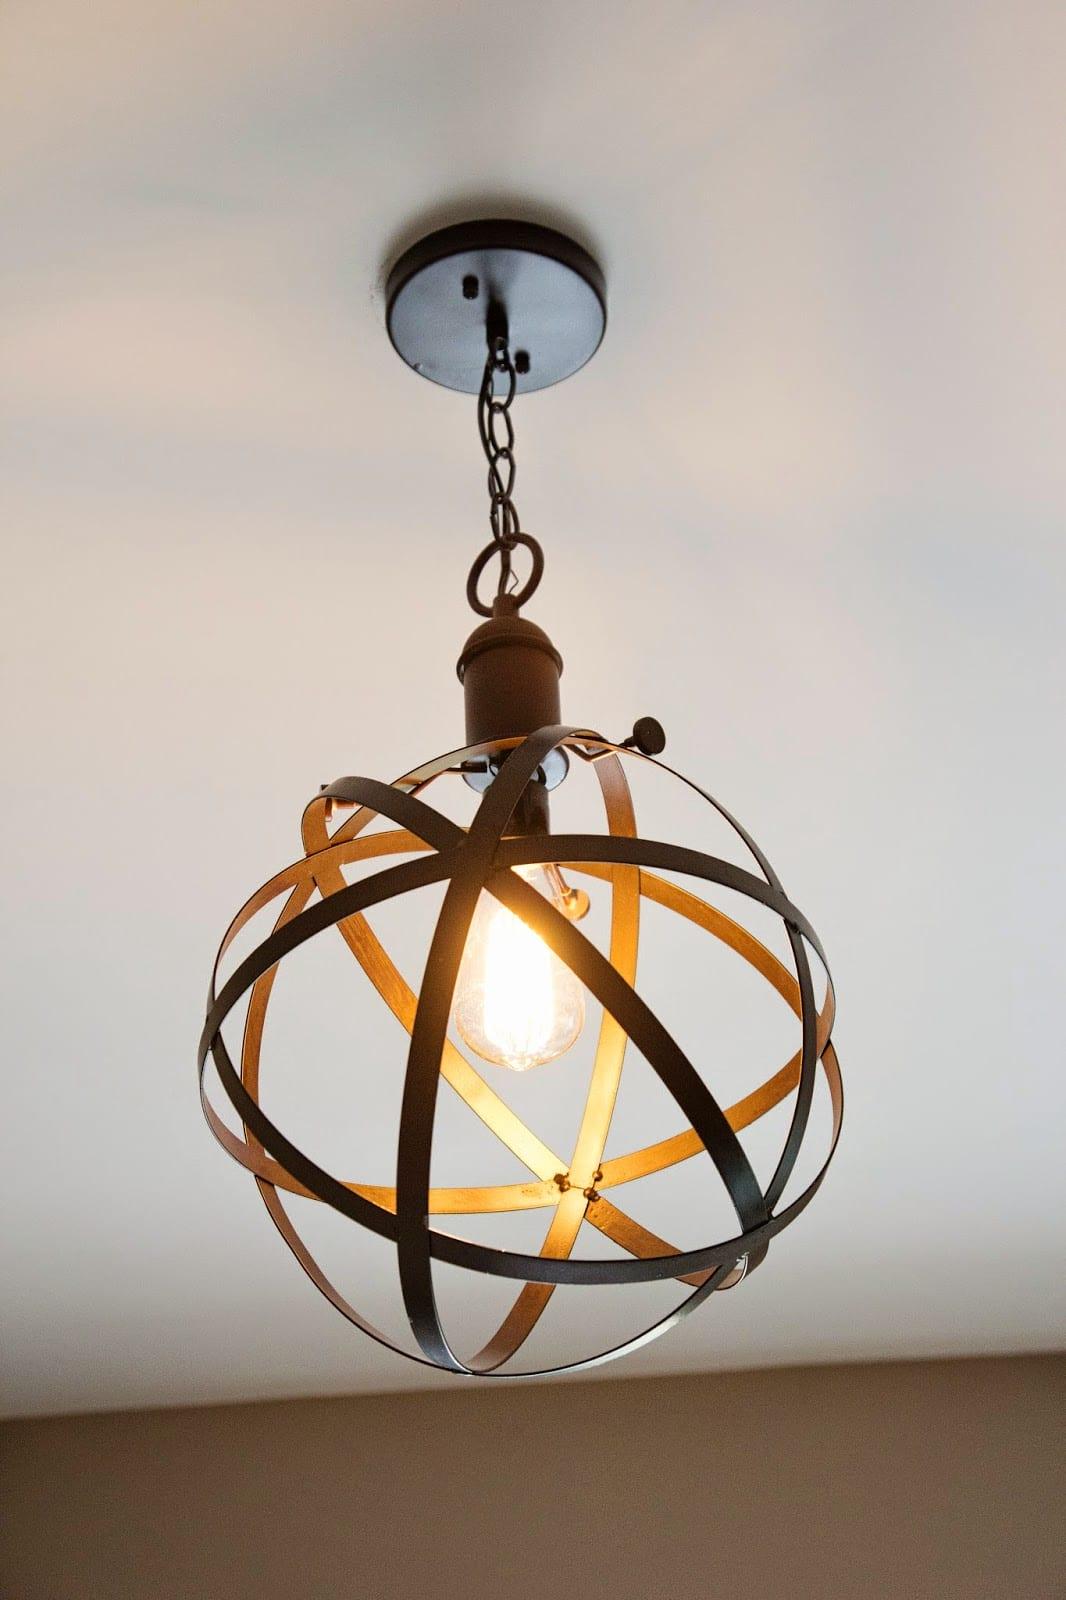 Diy Industrial Rustic Pendant Light  Bless'er House